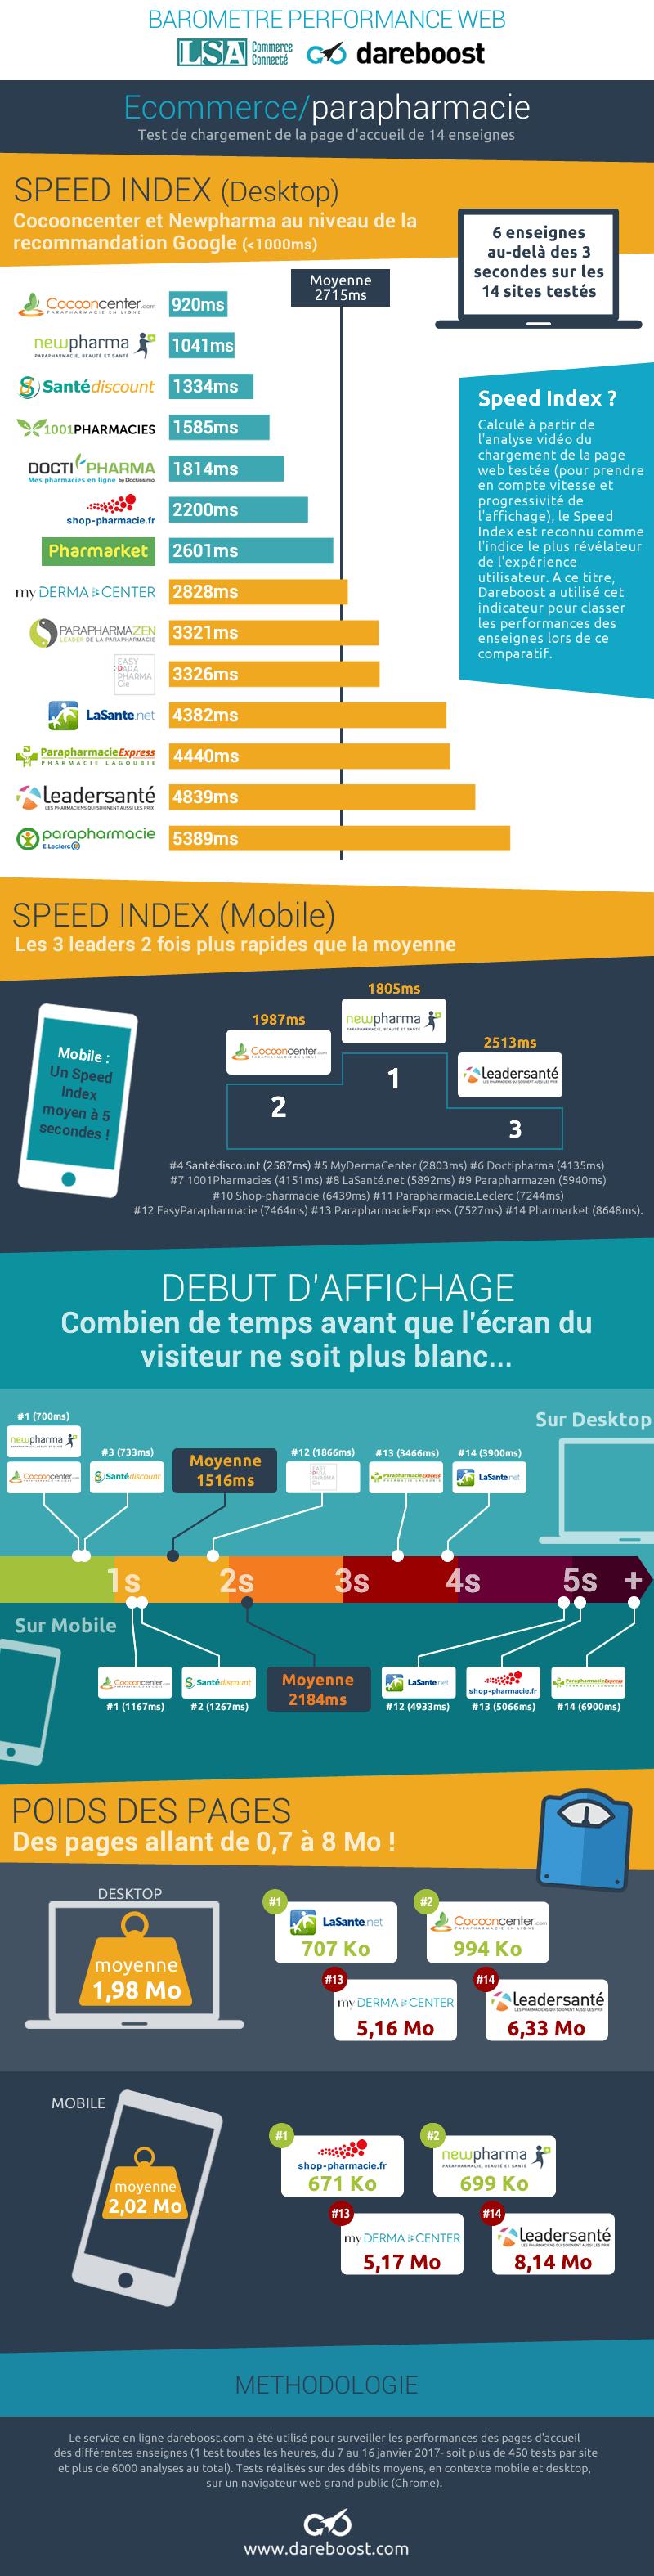 Baromètre performance web Dareboost/LSA - Parapharmacie